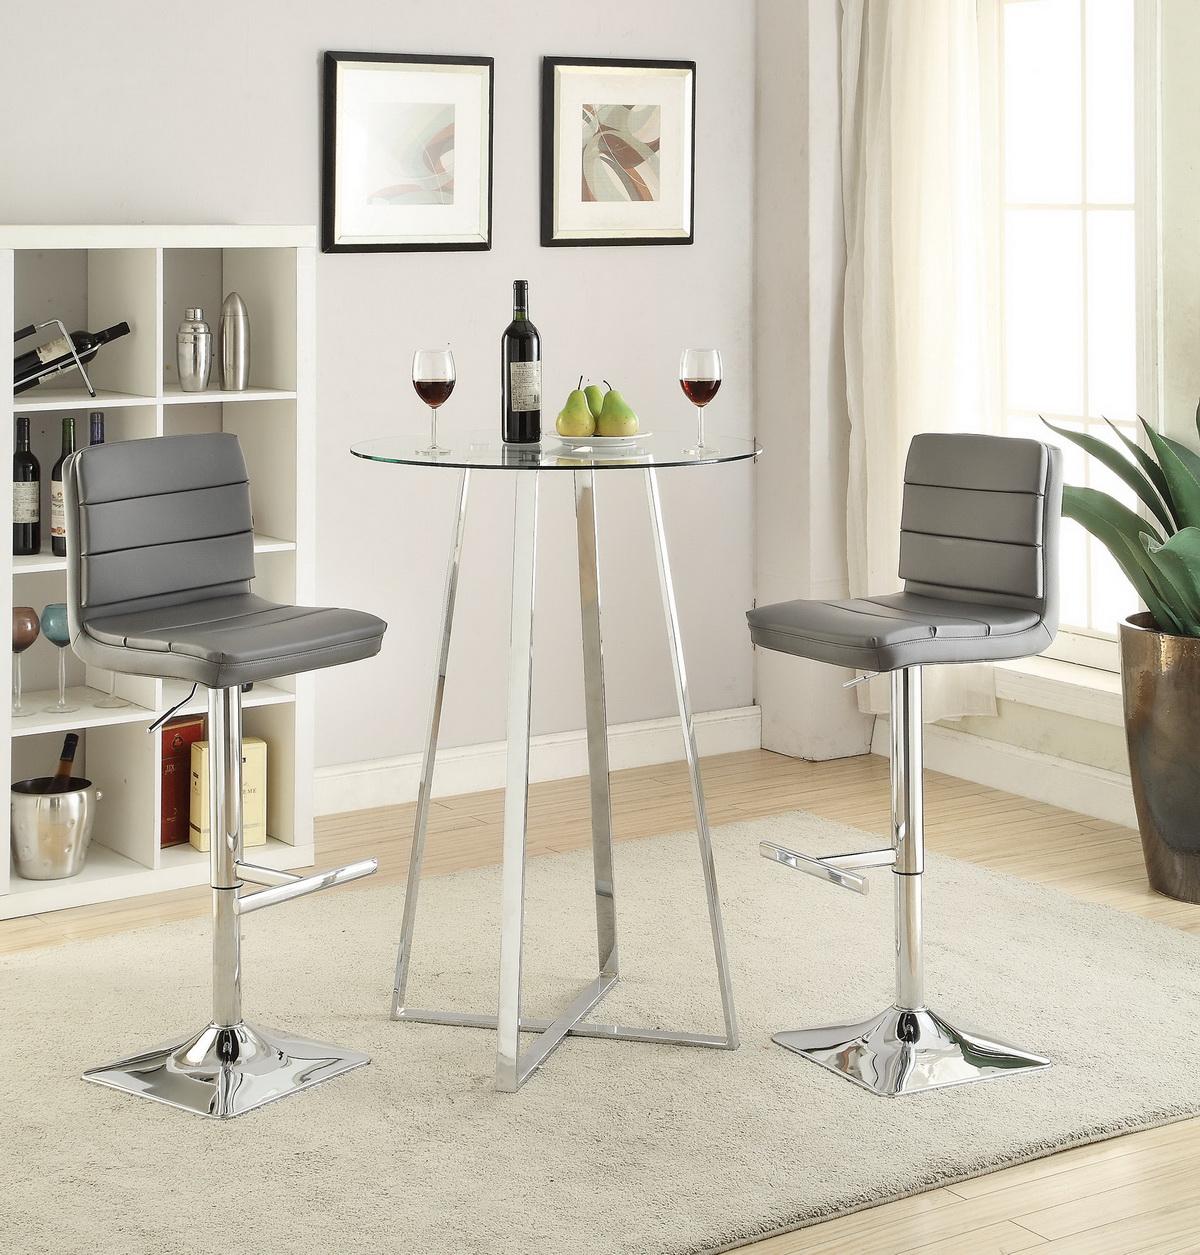 Julian Bar Table Collection Las Vegas Furniture Store Modern Home Furniture Cornerstone